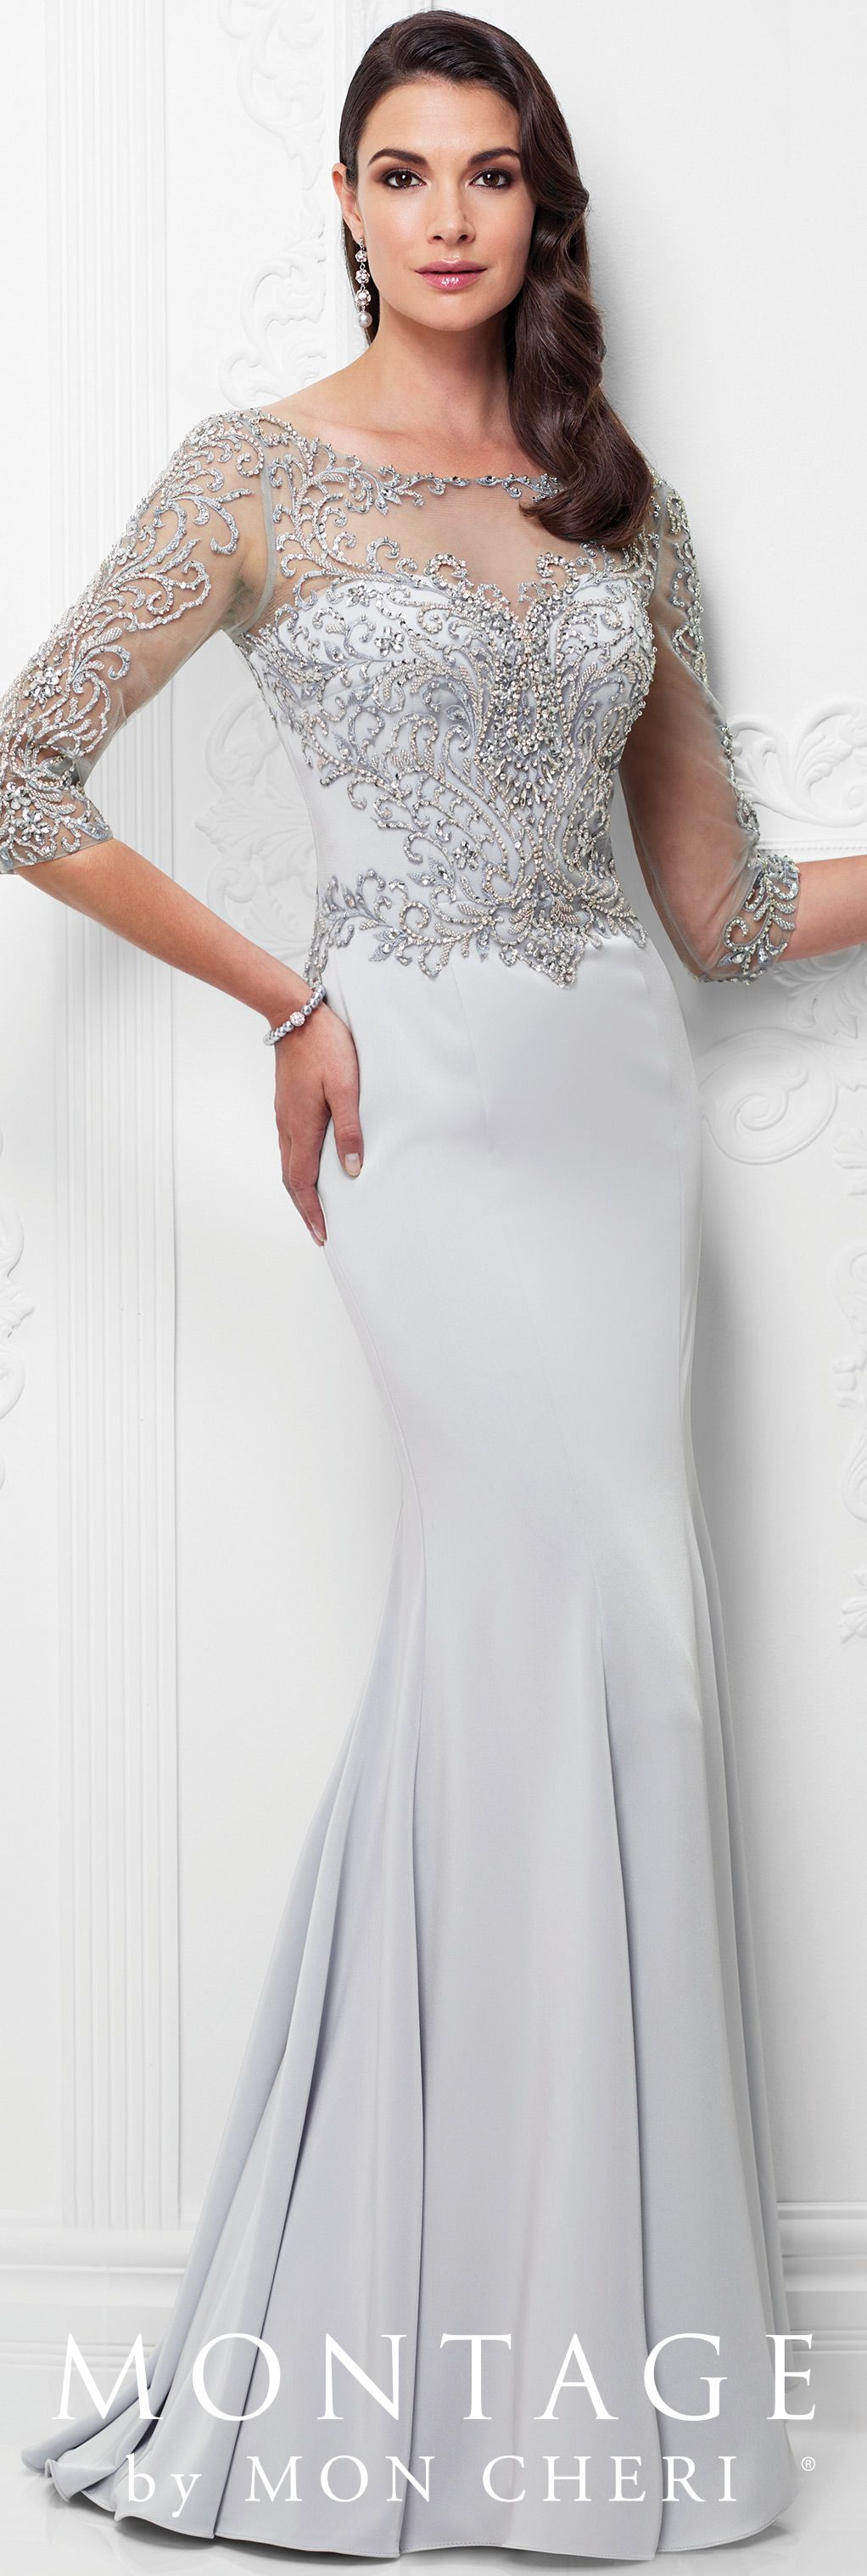 Montage by Mon Cheri - 117910   Evening Dresses   Pinterest   Grey ...